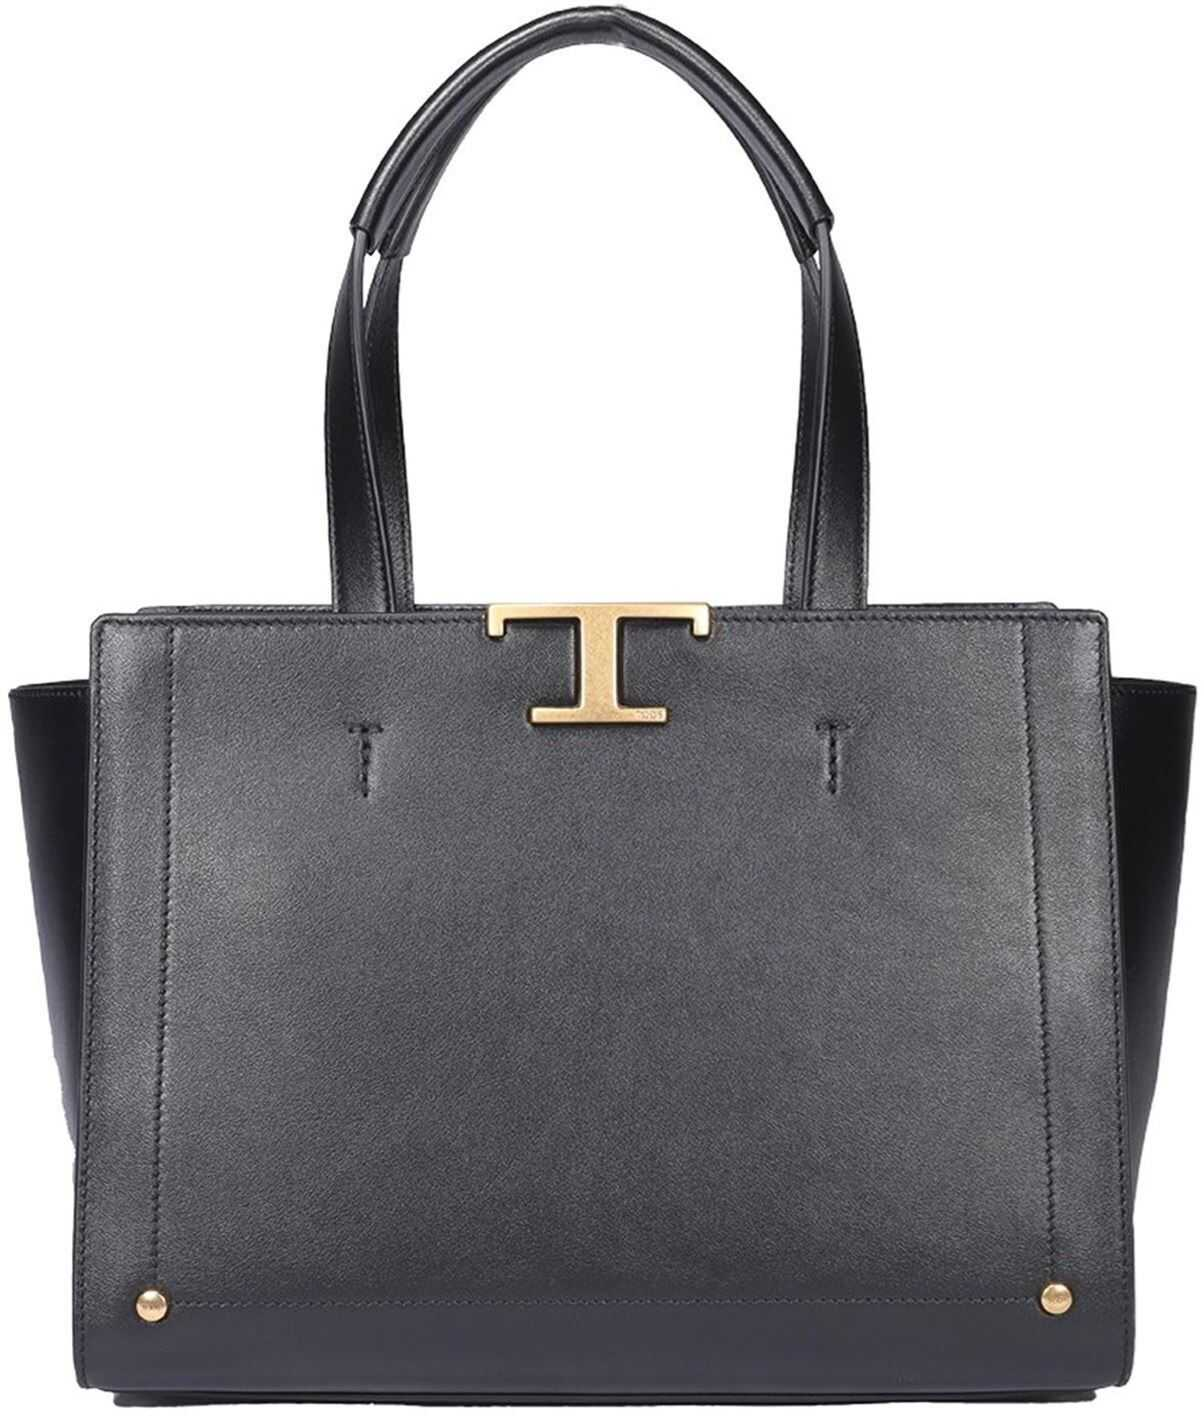 TOD'S Logo Plaque Large Tote Bag In Black XBWTSIFE300RORB999 Black imagine b-mall.ro